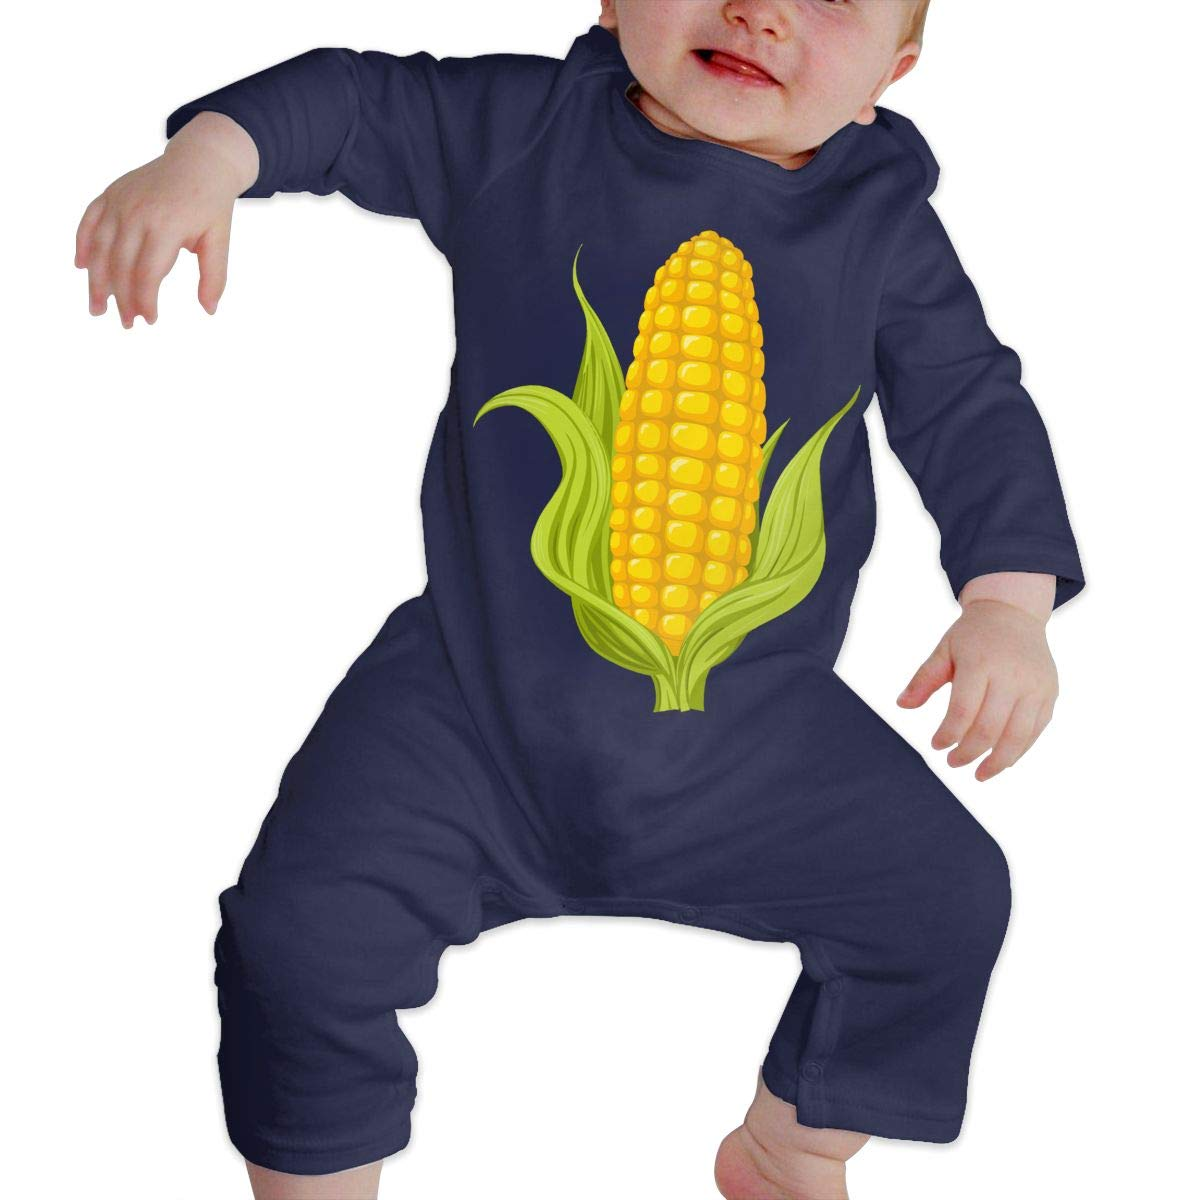 LBJQ8 Yellow Corn2 Newborn Toddler Baby Organic Cotton Romper Jumpsuit Bodysuit